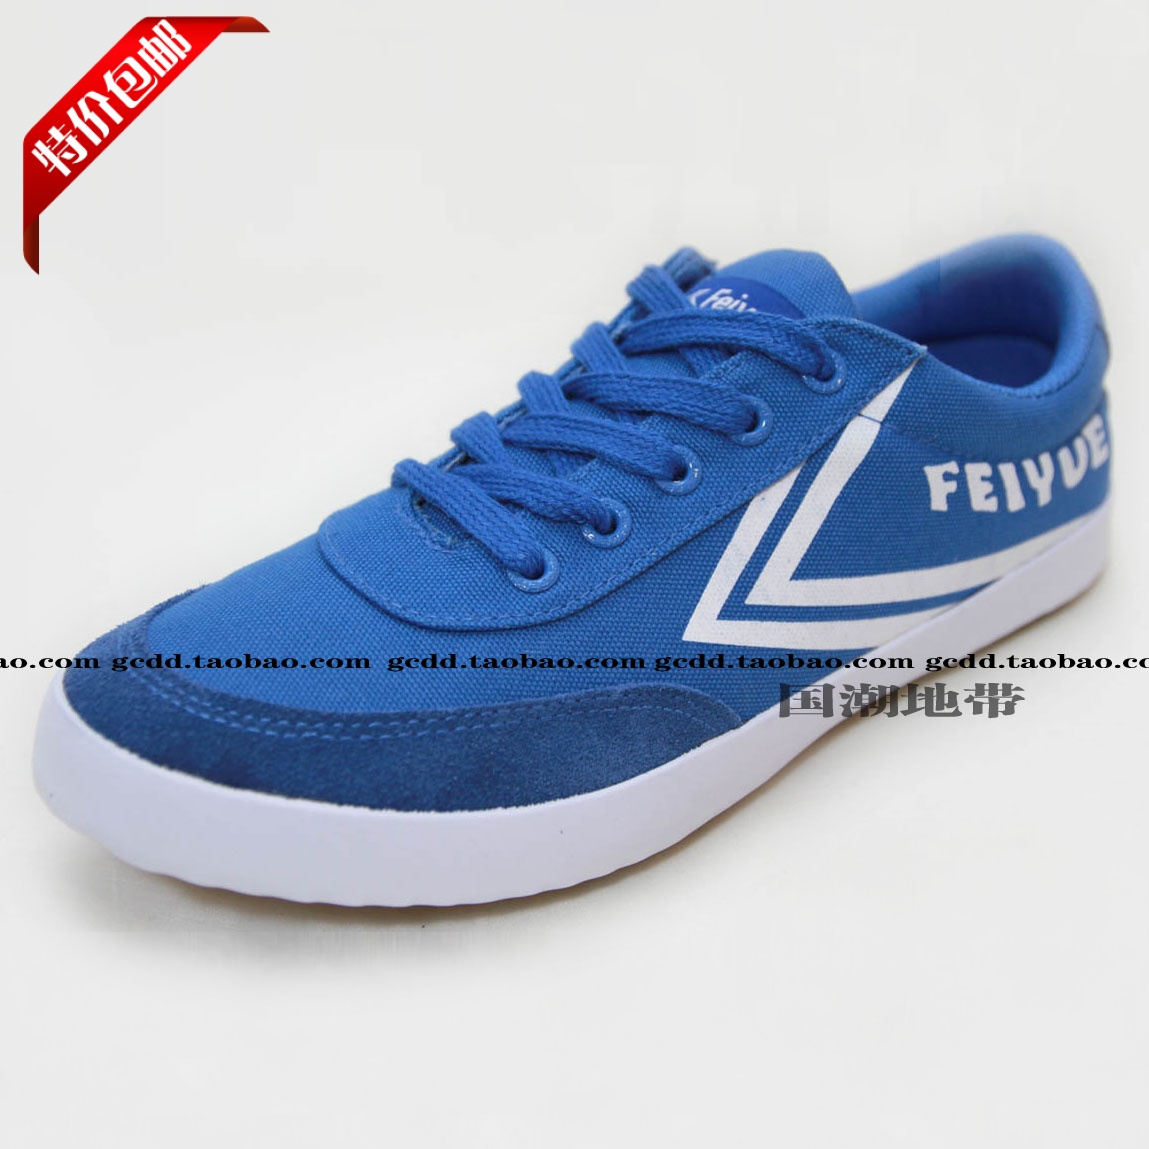 Спортивная обувь Leap FEIYUE  FEIYUE feiyue fy01 fy02 fy03 clutch fylh01